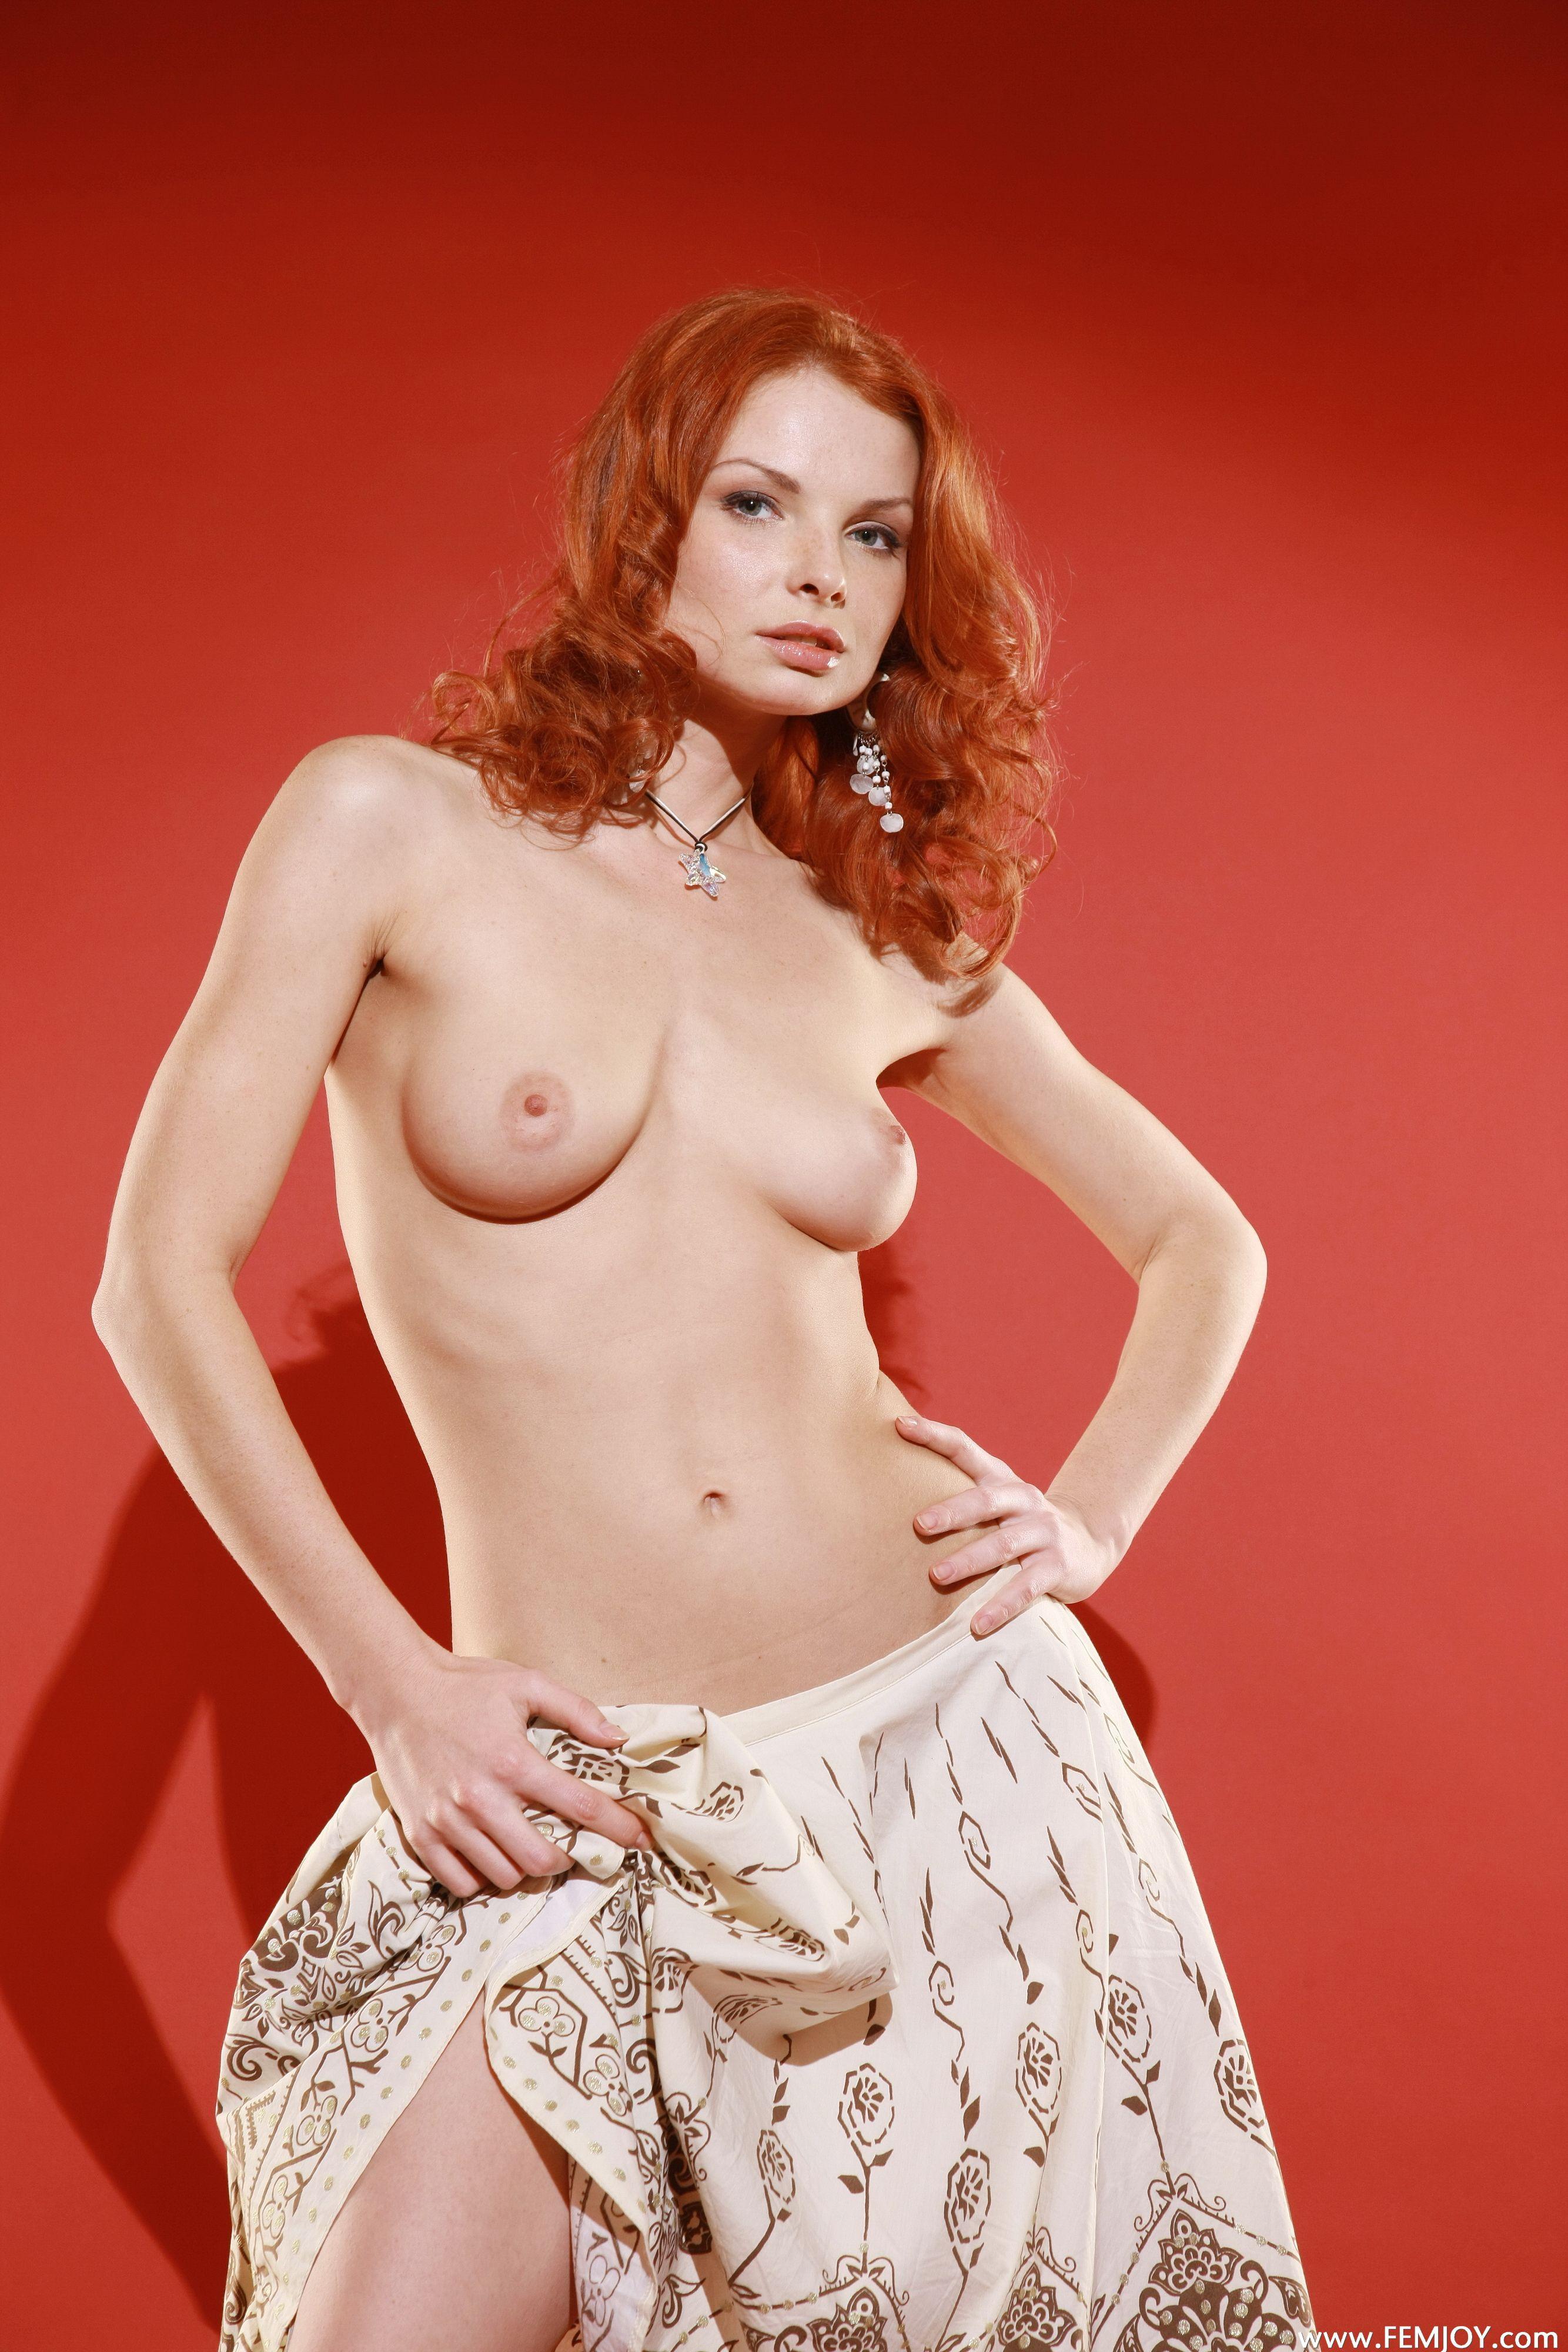 http://i6.imageban.ru/out/2013/11/13/529ab8149afb271401087b5de0854058.jpg